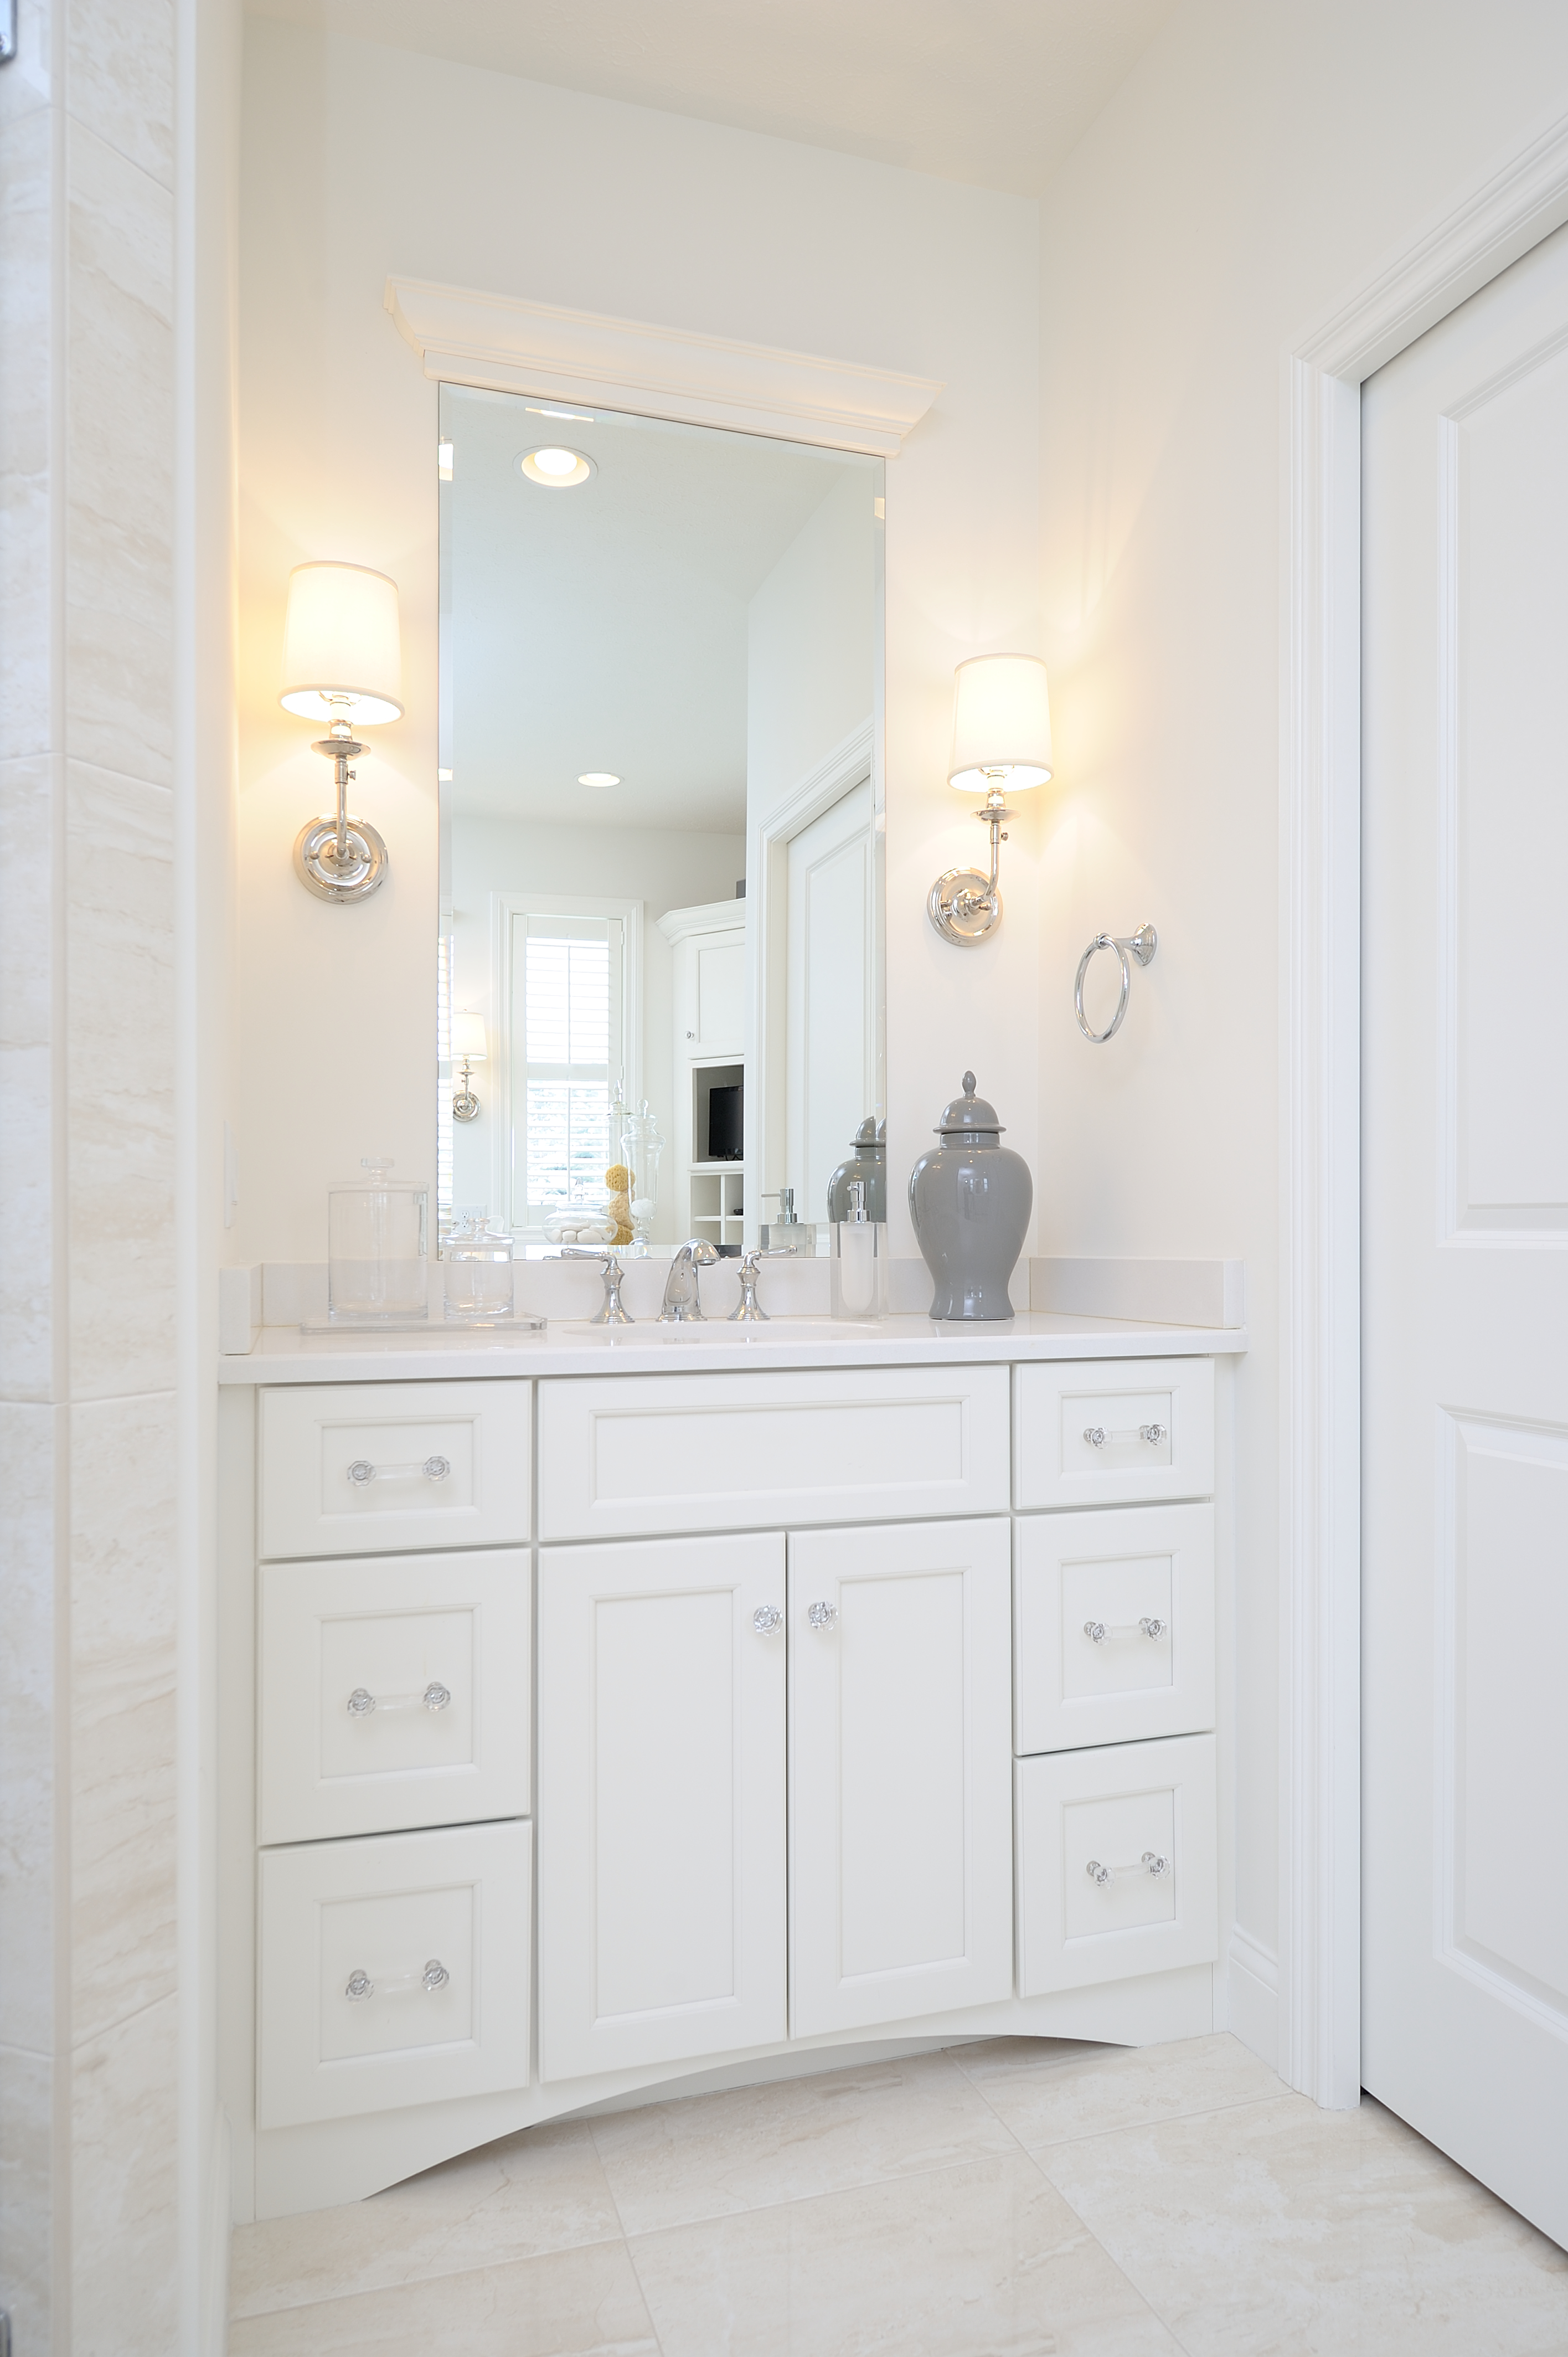 Bathrooms New And Remodels Kalamazoo Custom Kitchens And Baths Inc